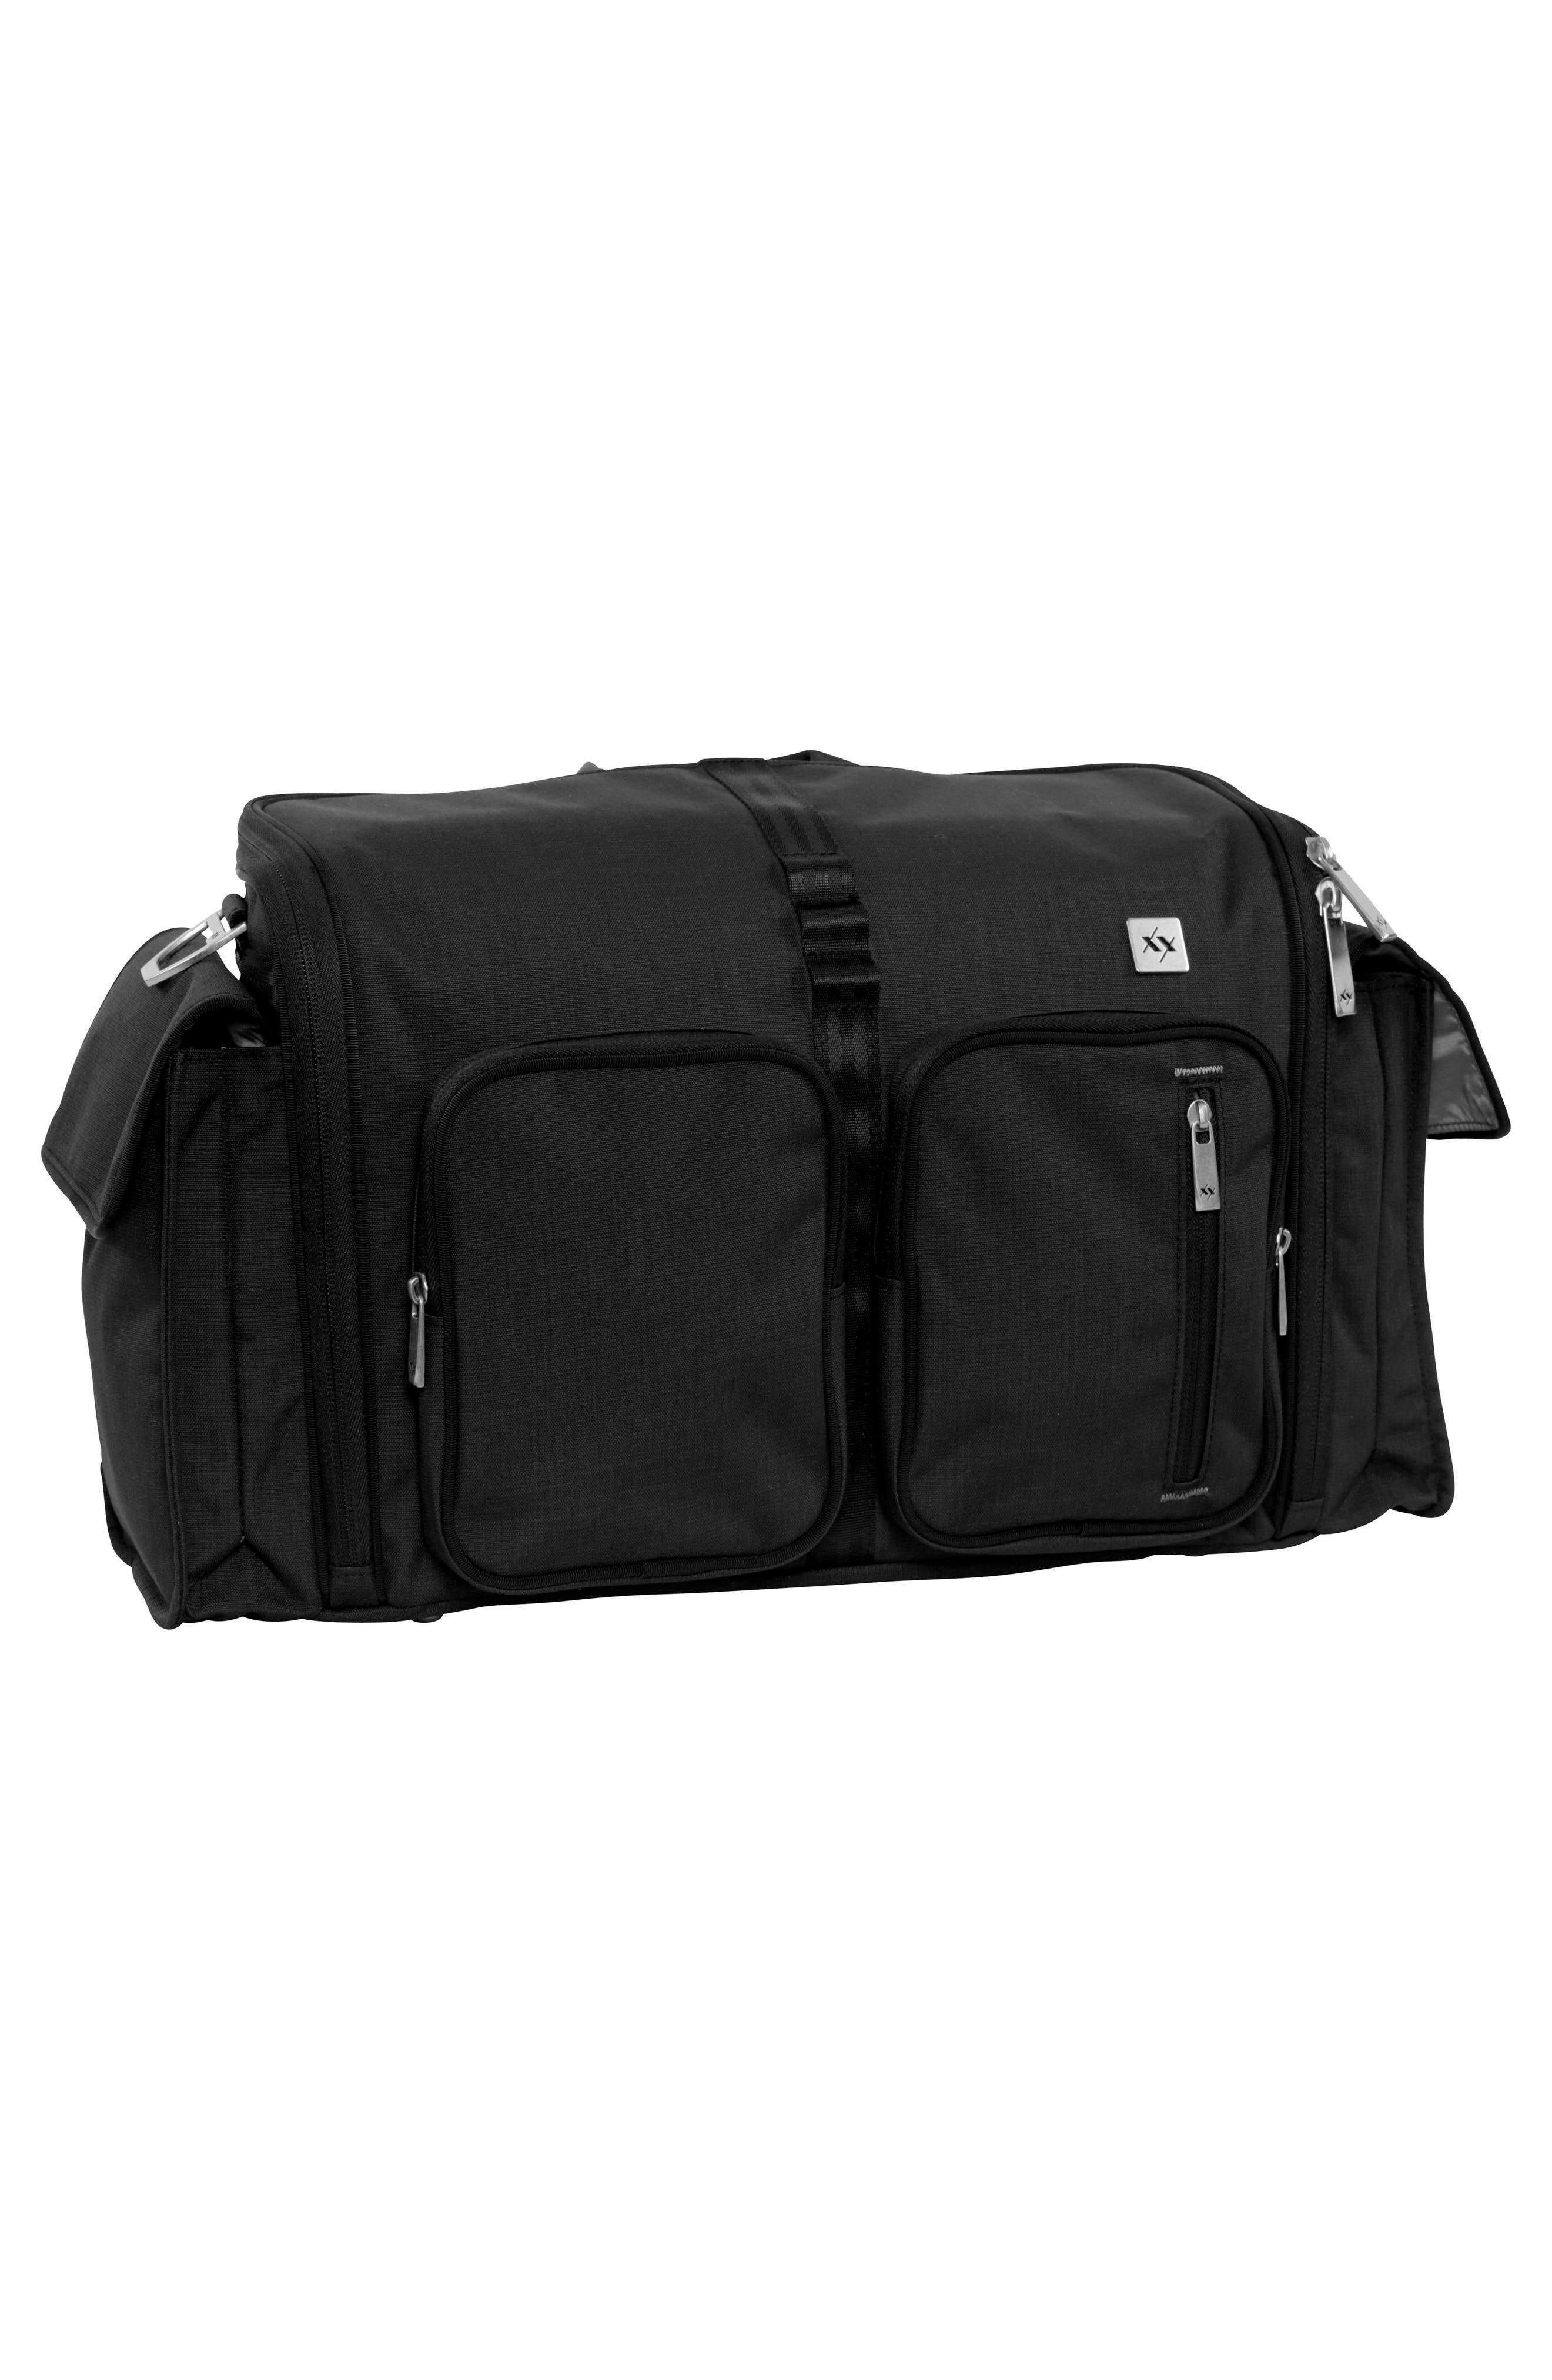 XY Clone Diaper Bag,                             Alternate thumbnail 6, color,                             CARBON